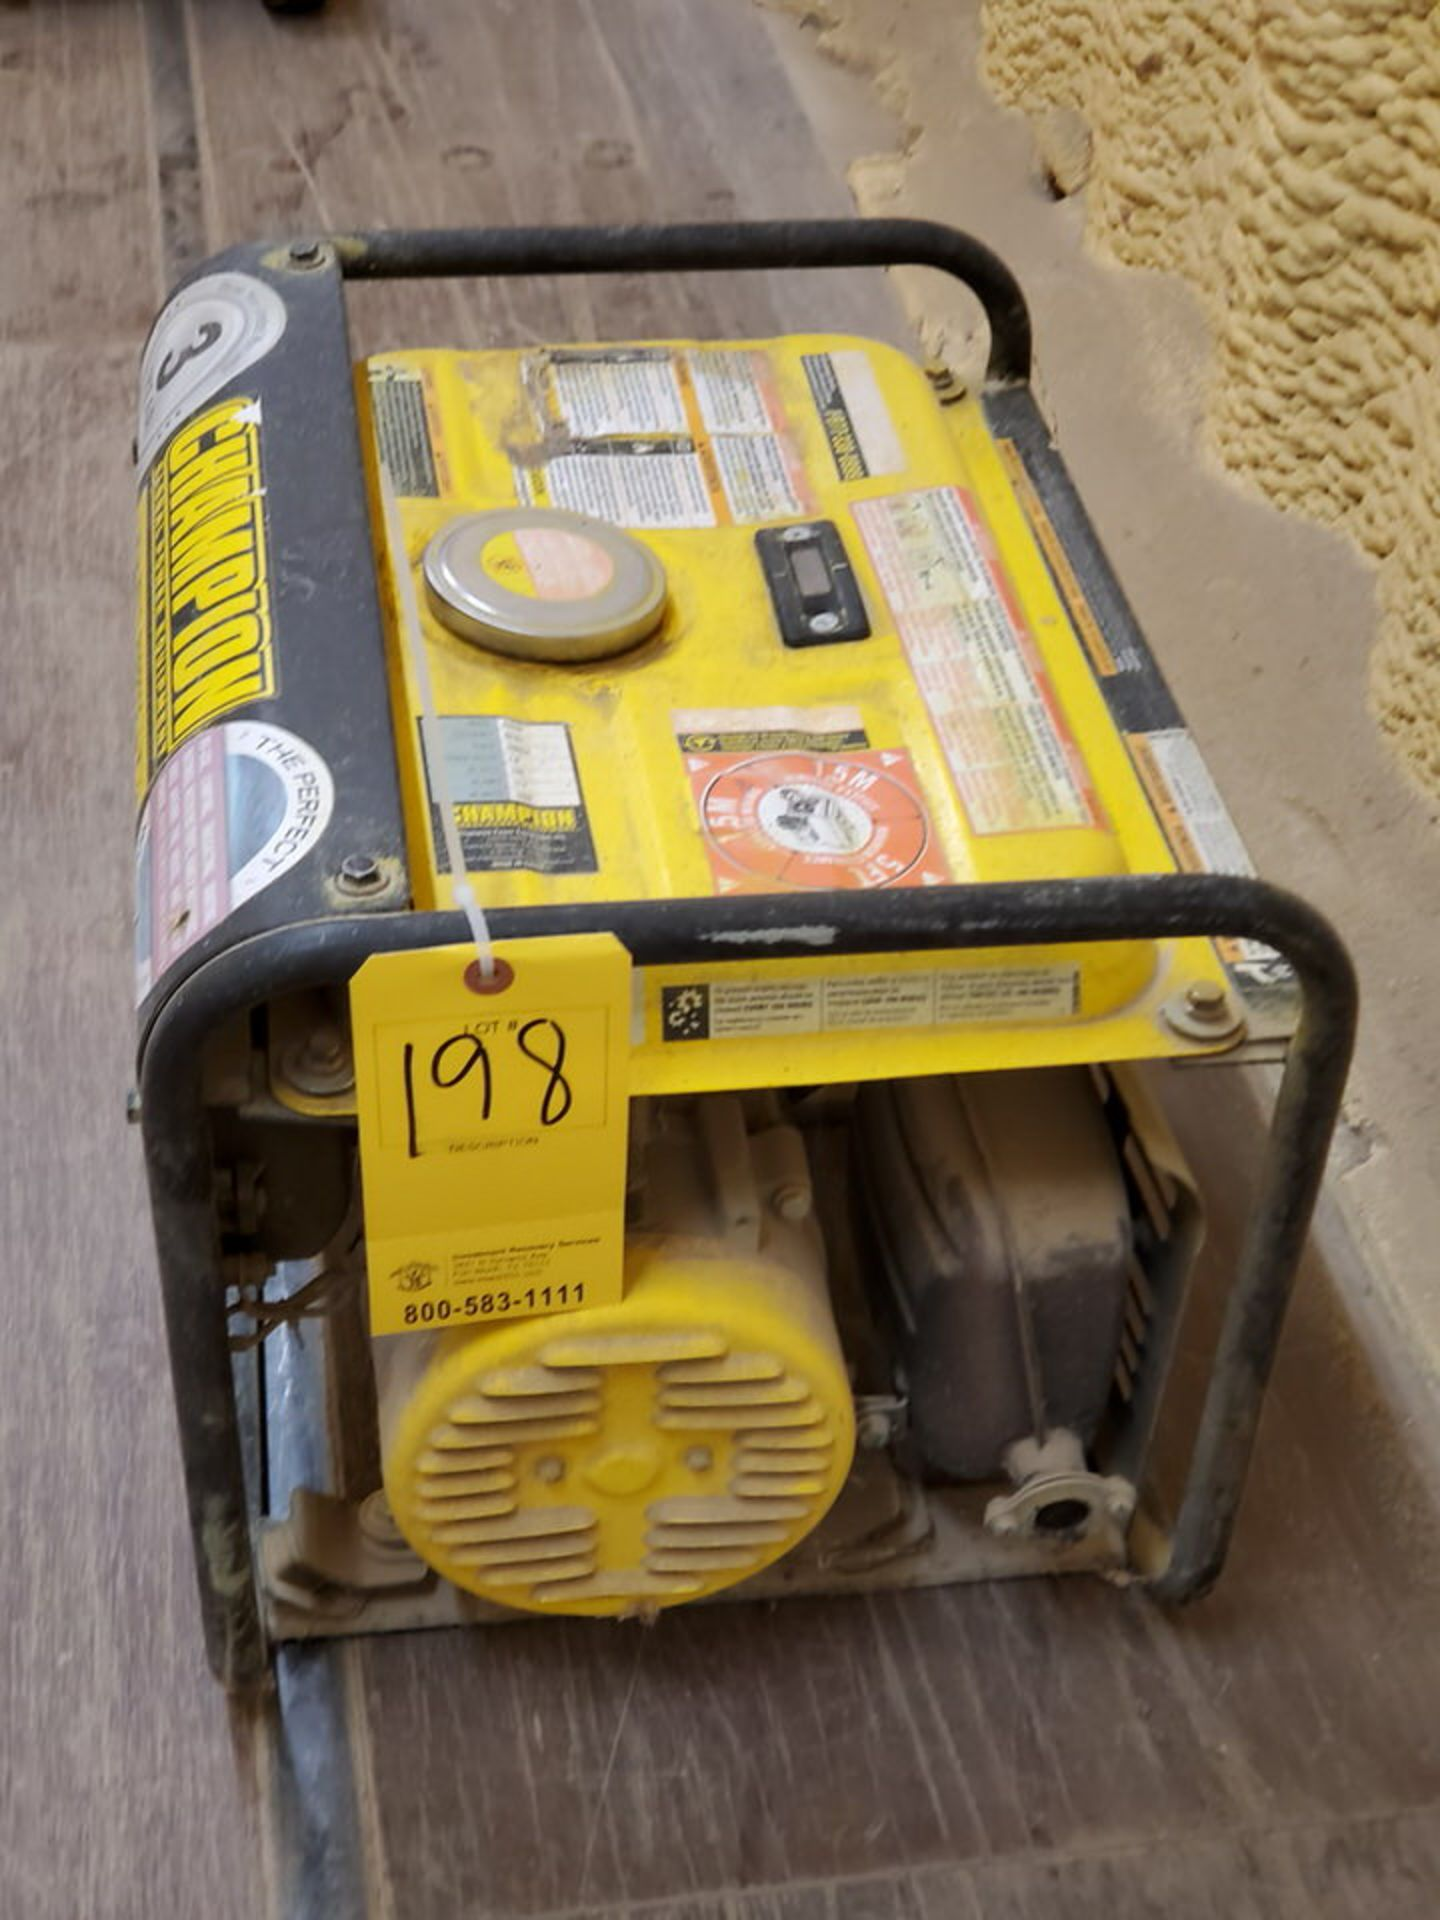 Champion 42432 Portable Generator 1400W, W/ 80cc Engine, 1PH, 60HZ, 120V, 11.7A - Image 4 of 7